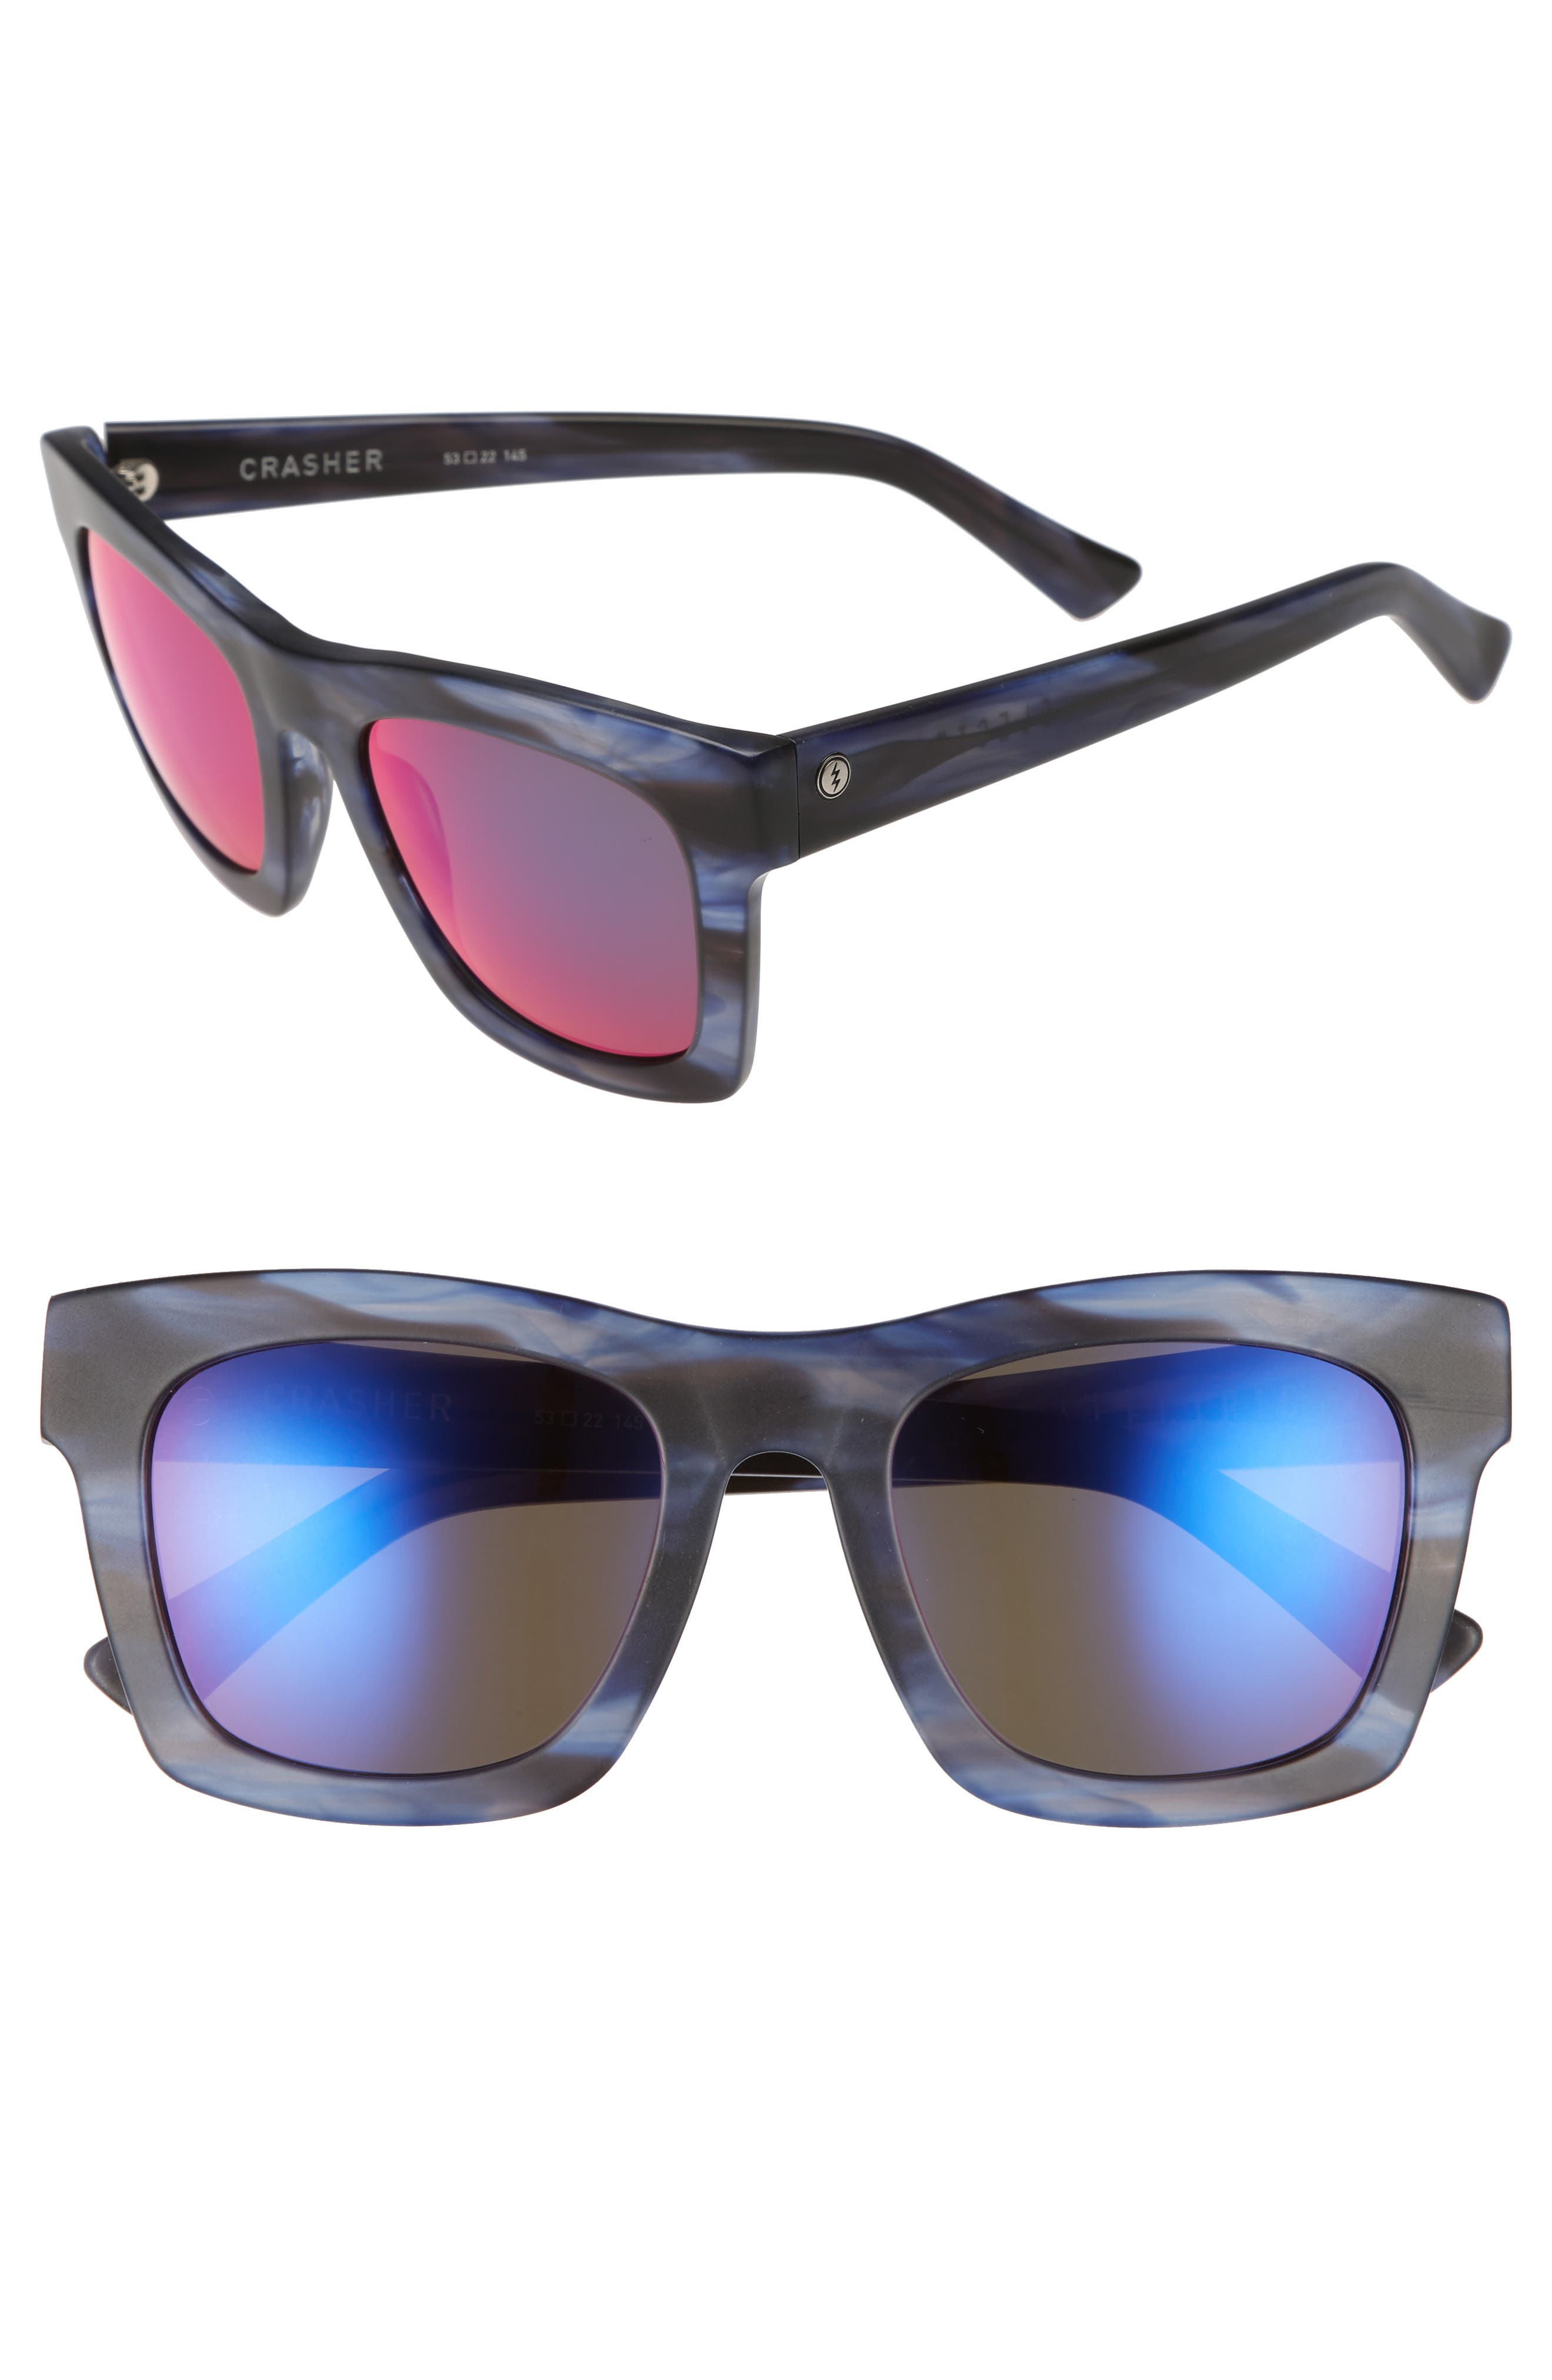 Crasher 53mm Mirrored Sunglasses,                             Main thumbnail 1, color,                             Skyline/ Plasma